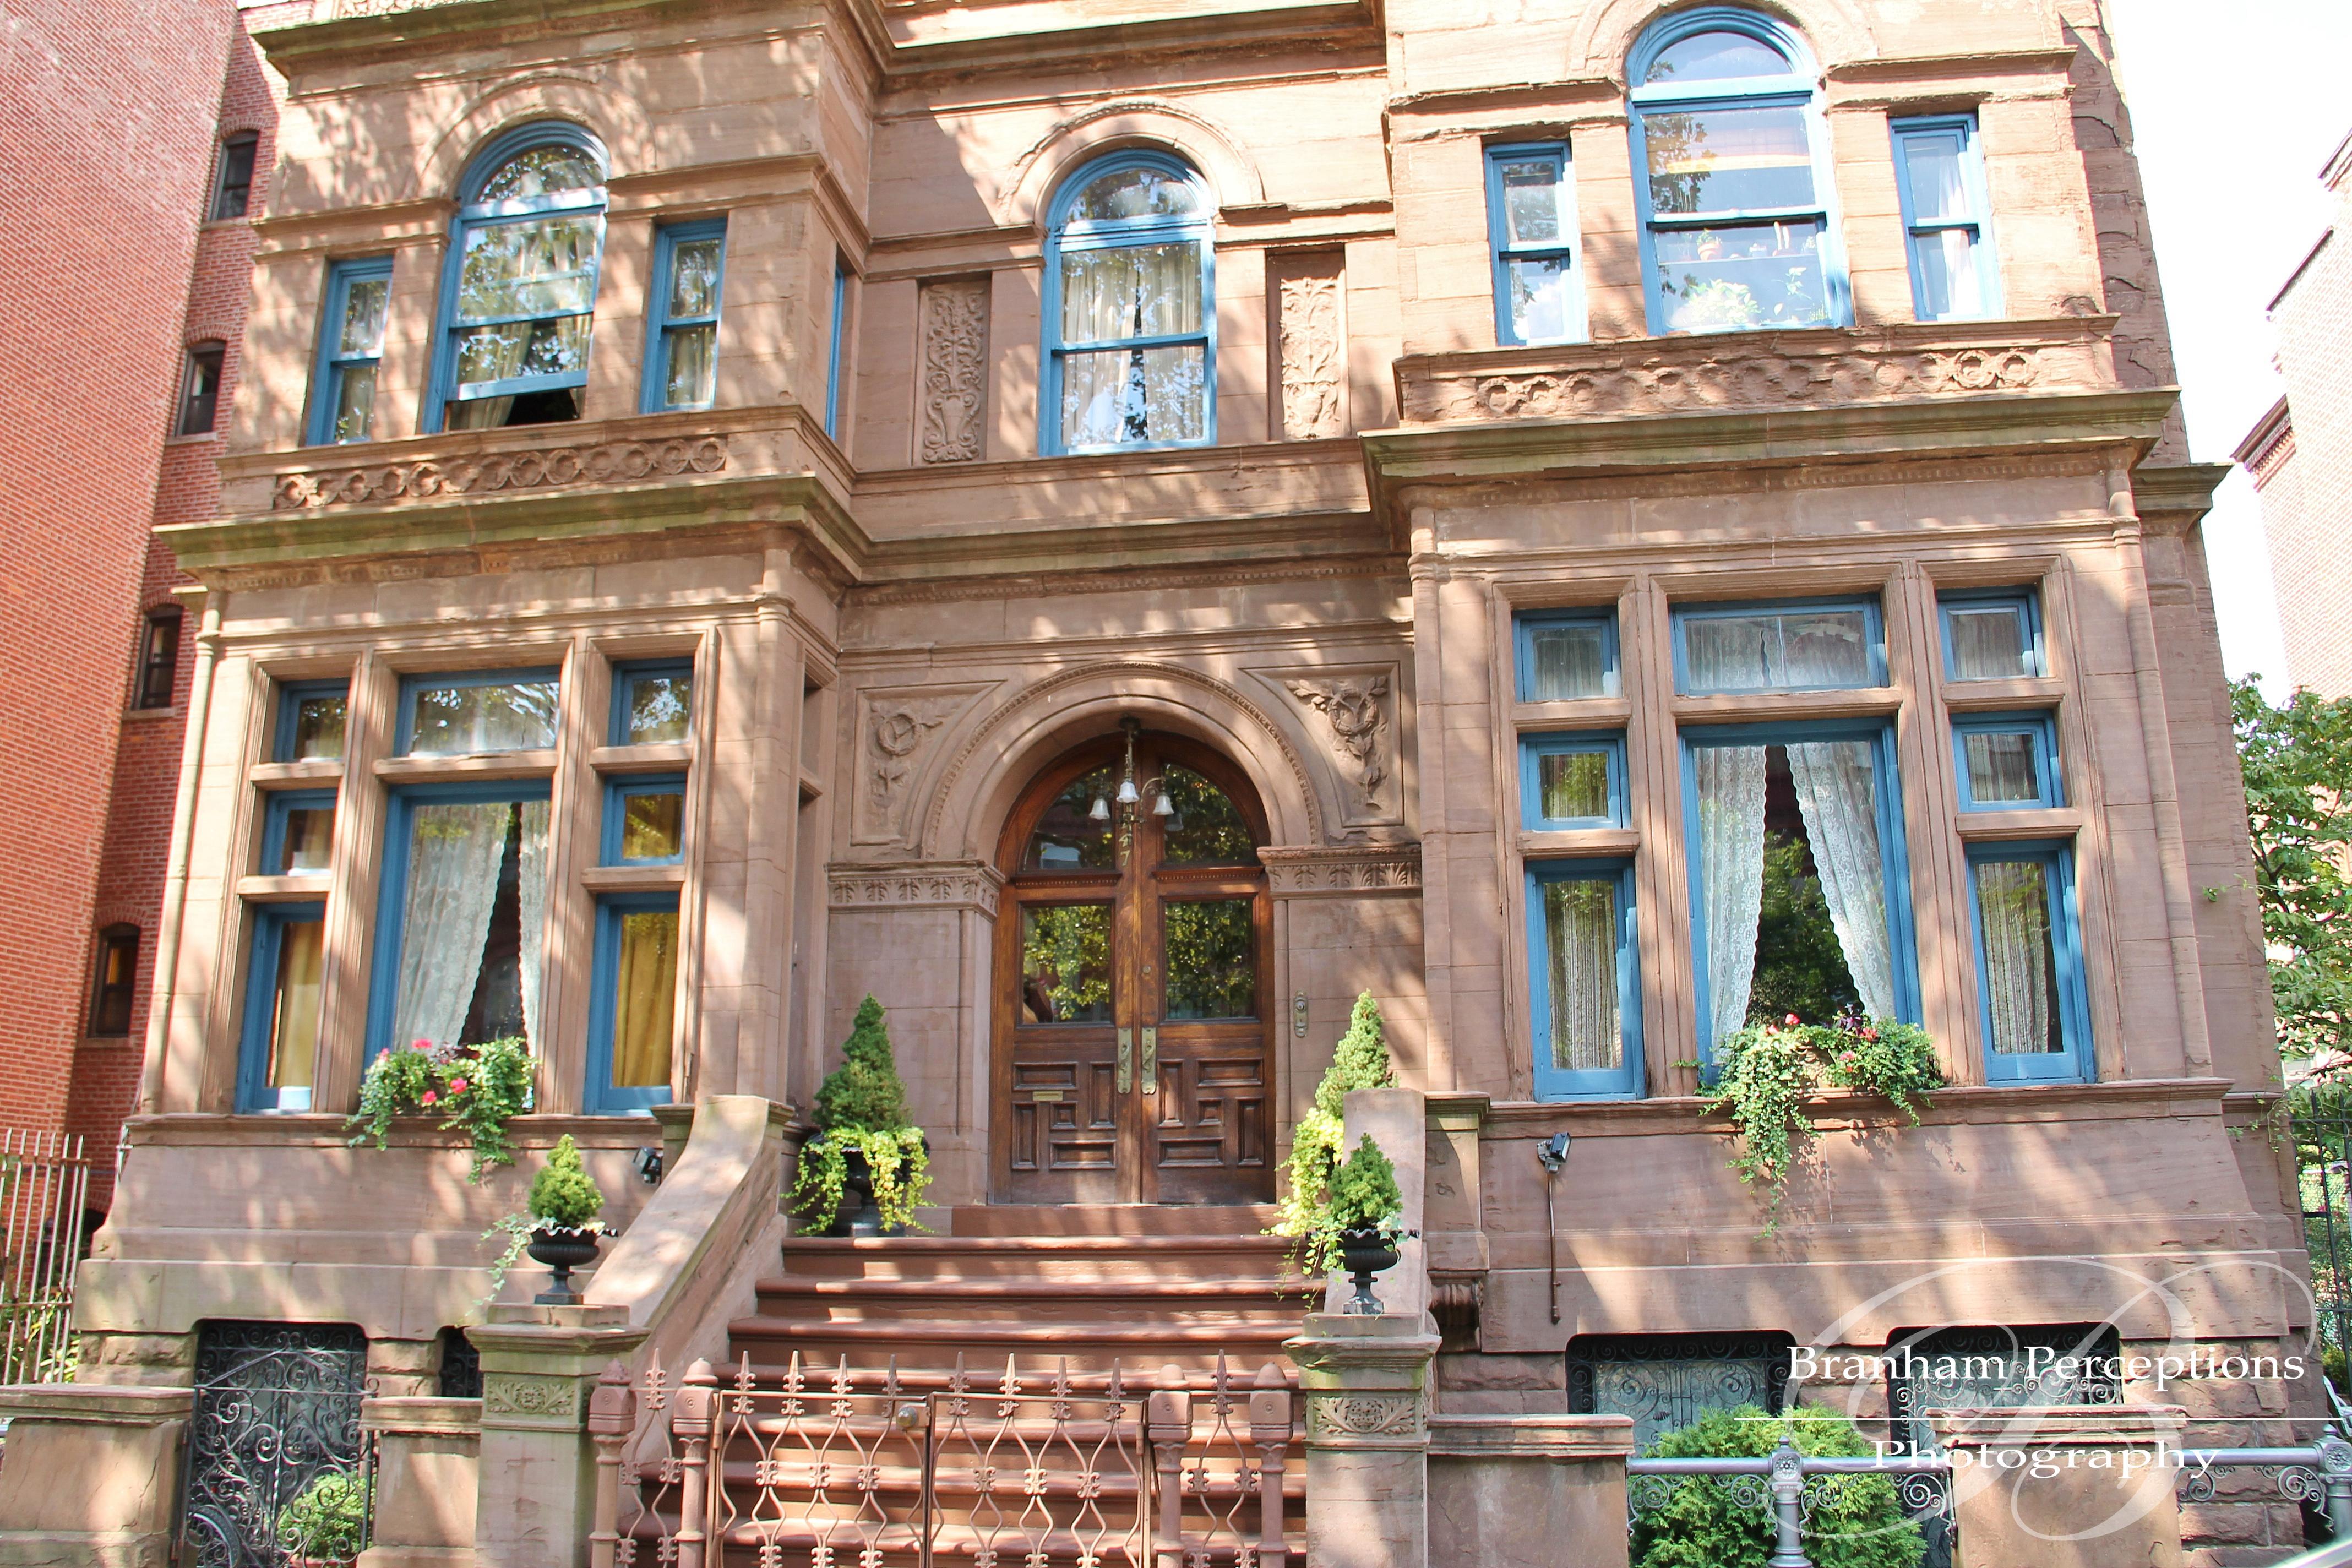 Moran victorian mansion branham perceptions photography - Mansion victoriana ...